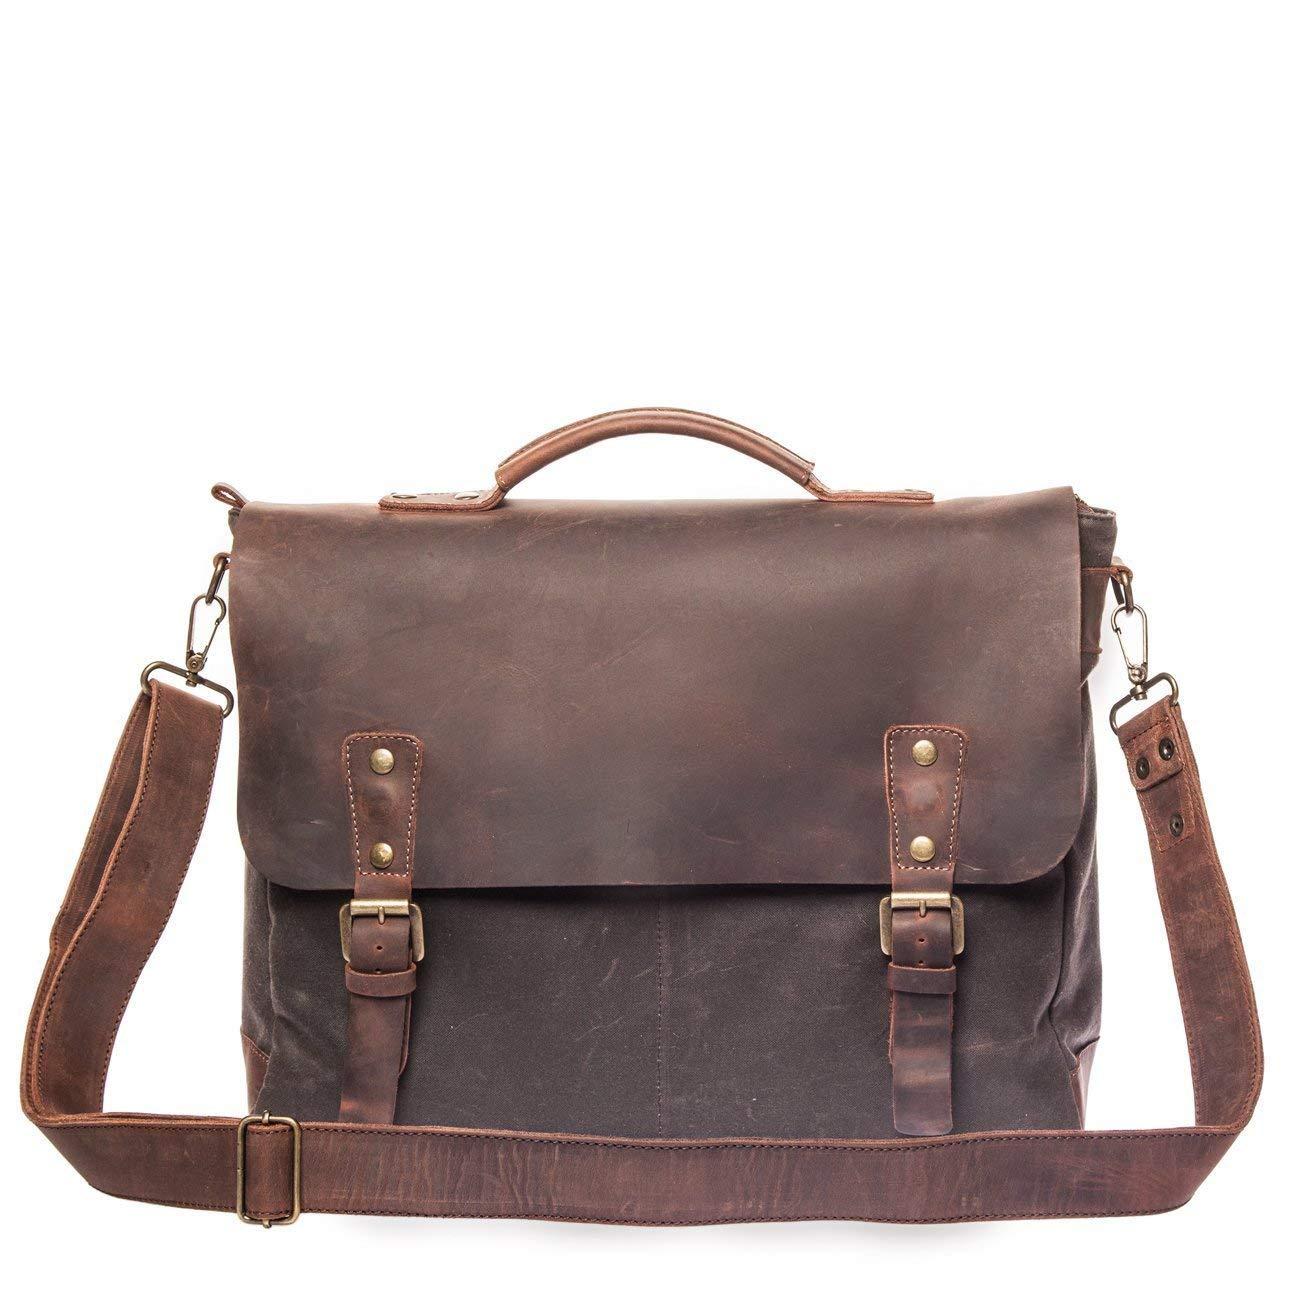 Vintage Handmade Satchel Bag - British Made Waxed Canvas & Alcanena Leather - Laptop Briefcase for Man